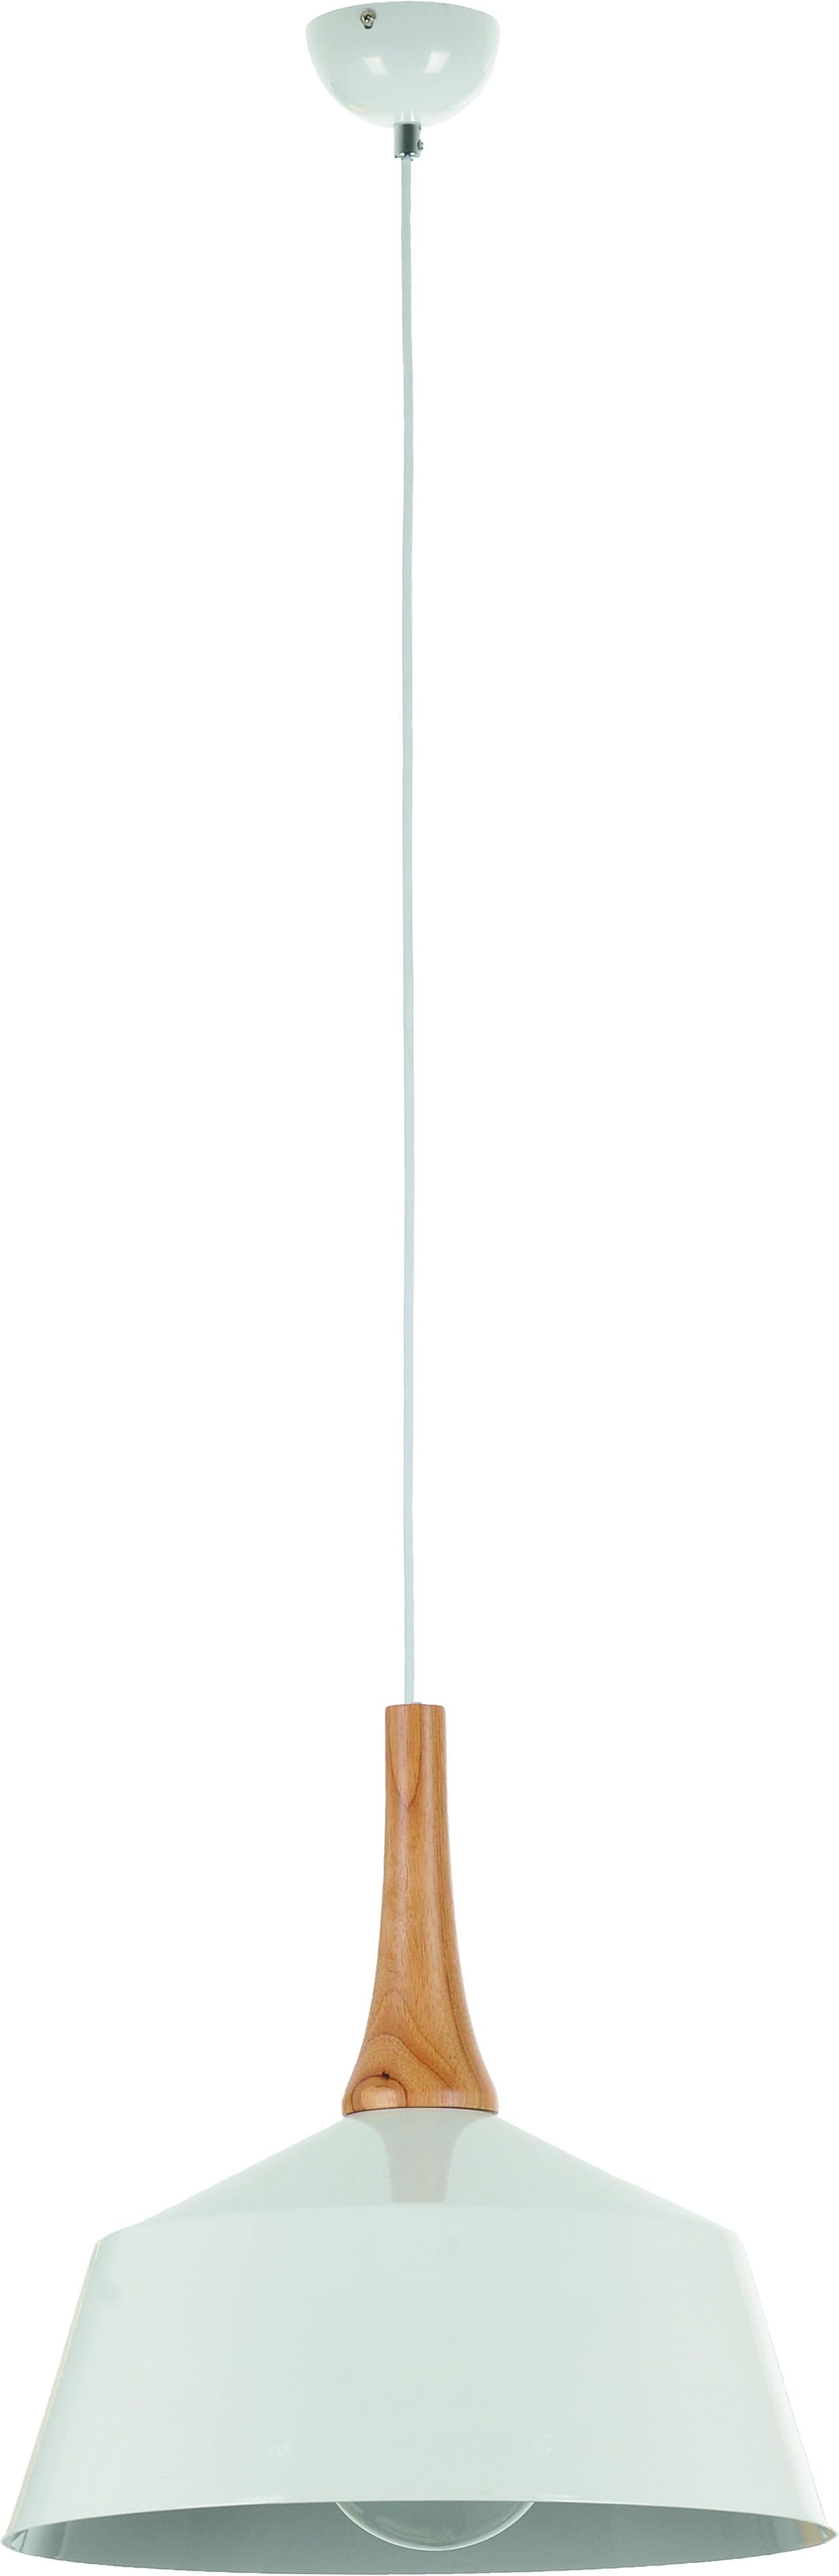 Hanging lamp in Scandinavian style Reja